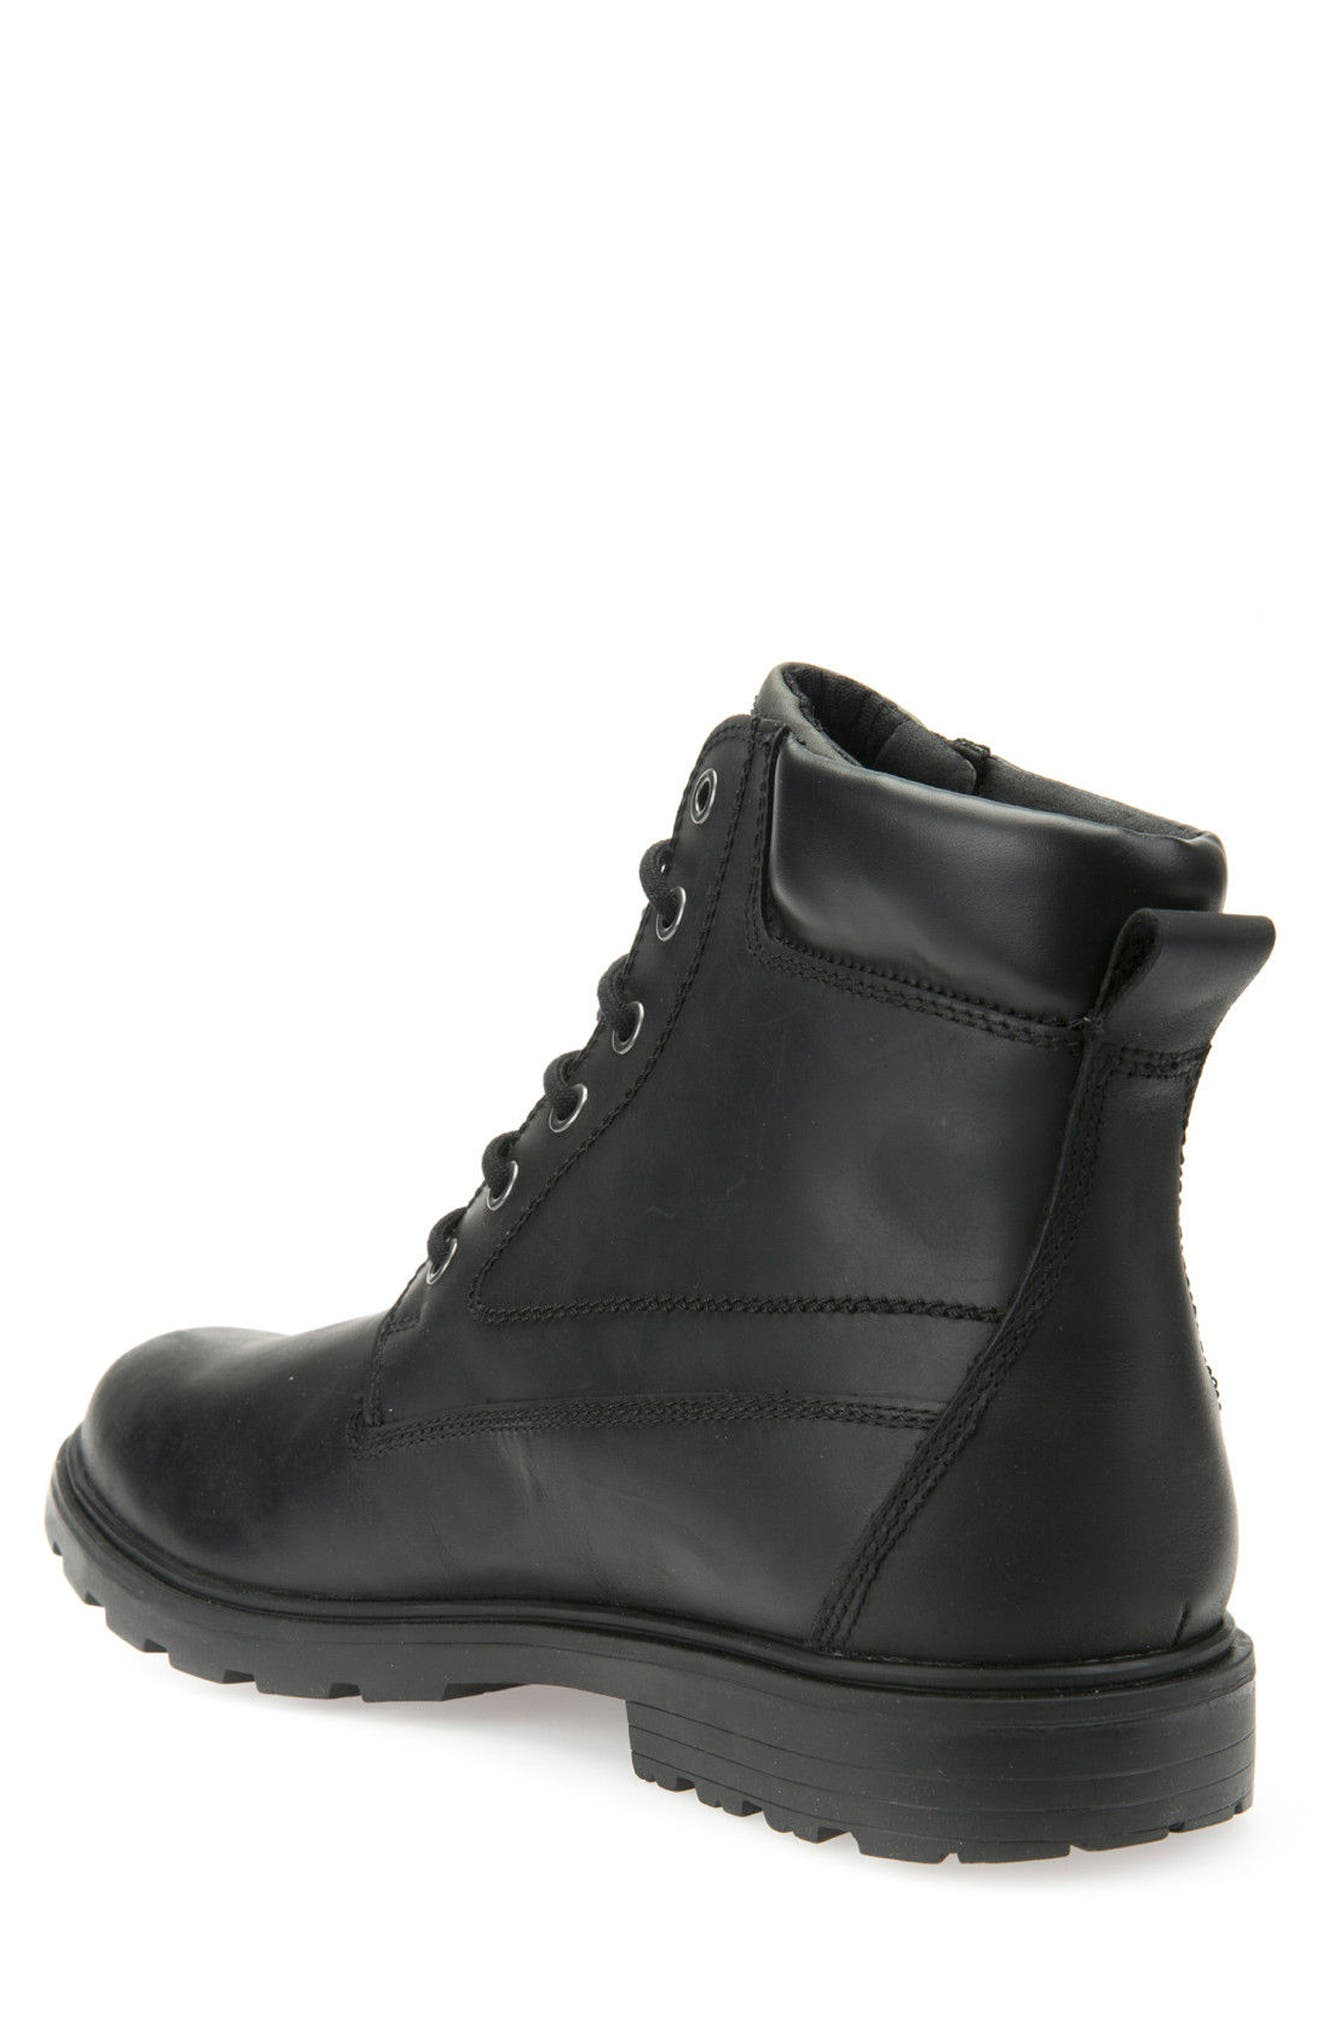 Makim Waterproof Plain Toe Boot,                             Alternate thumbnail 2, color,                             Black